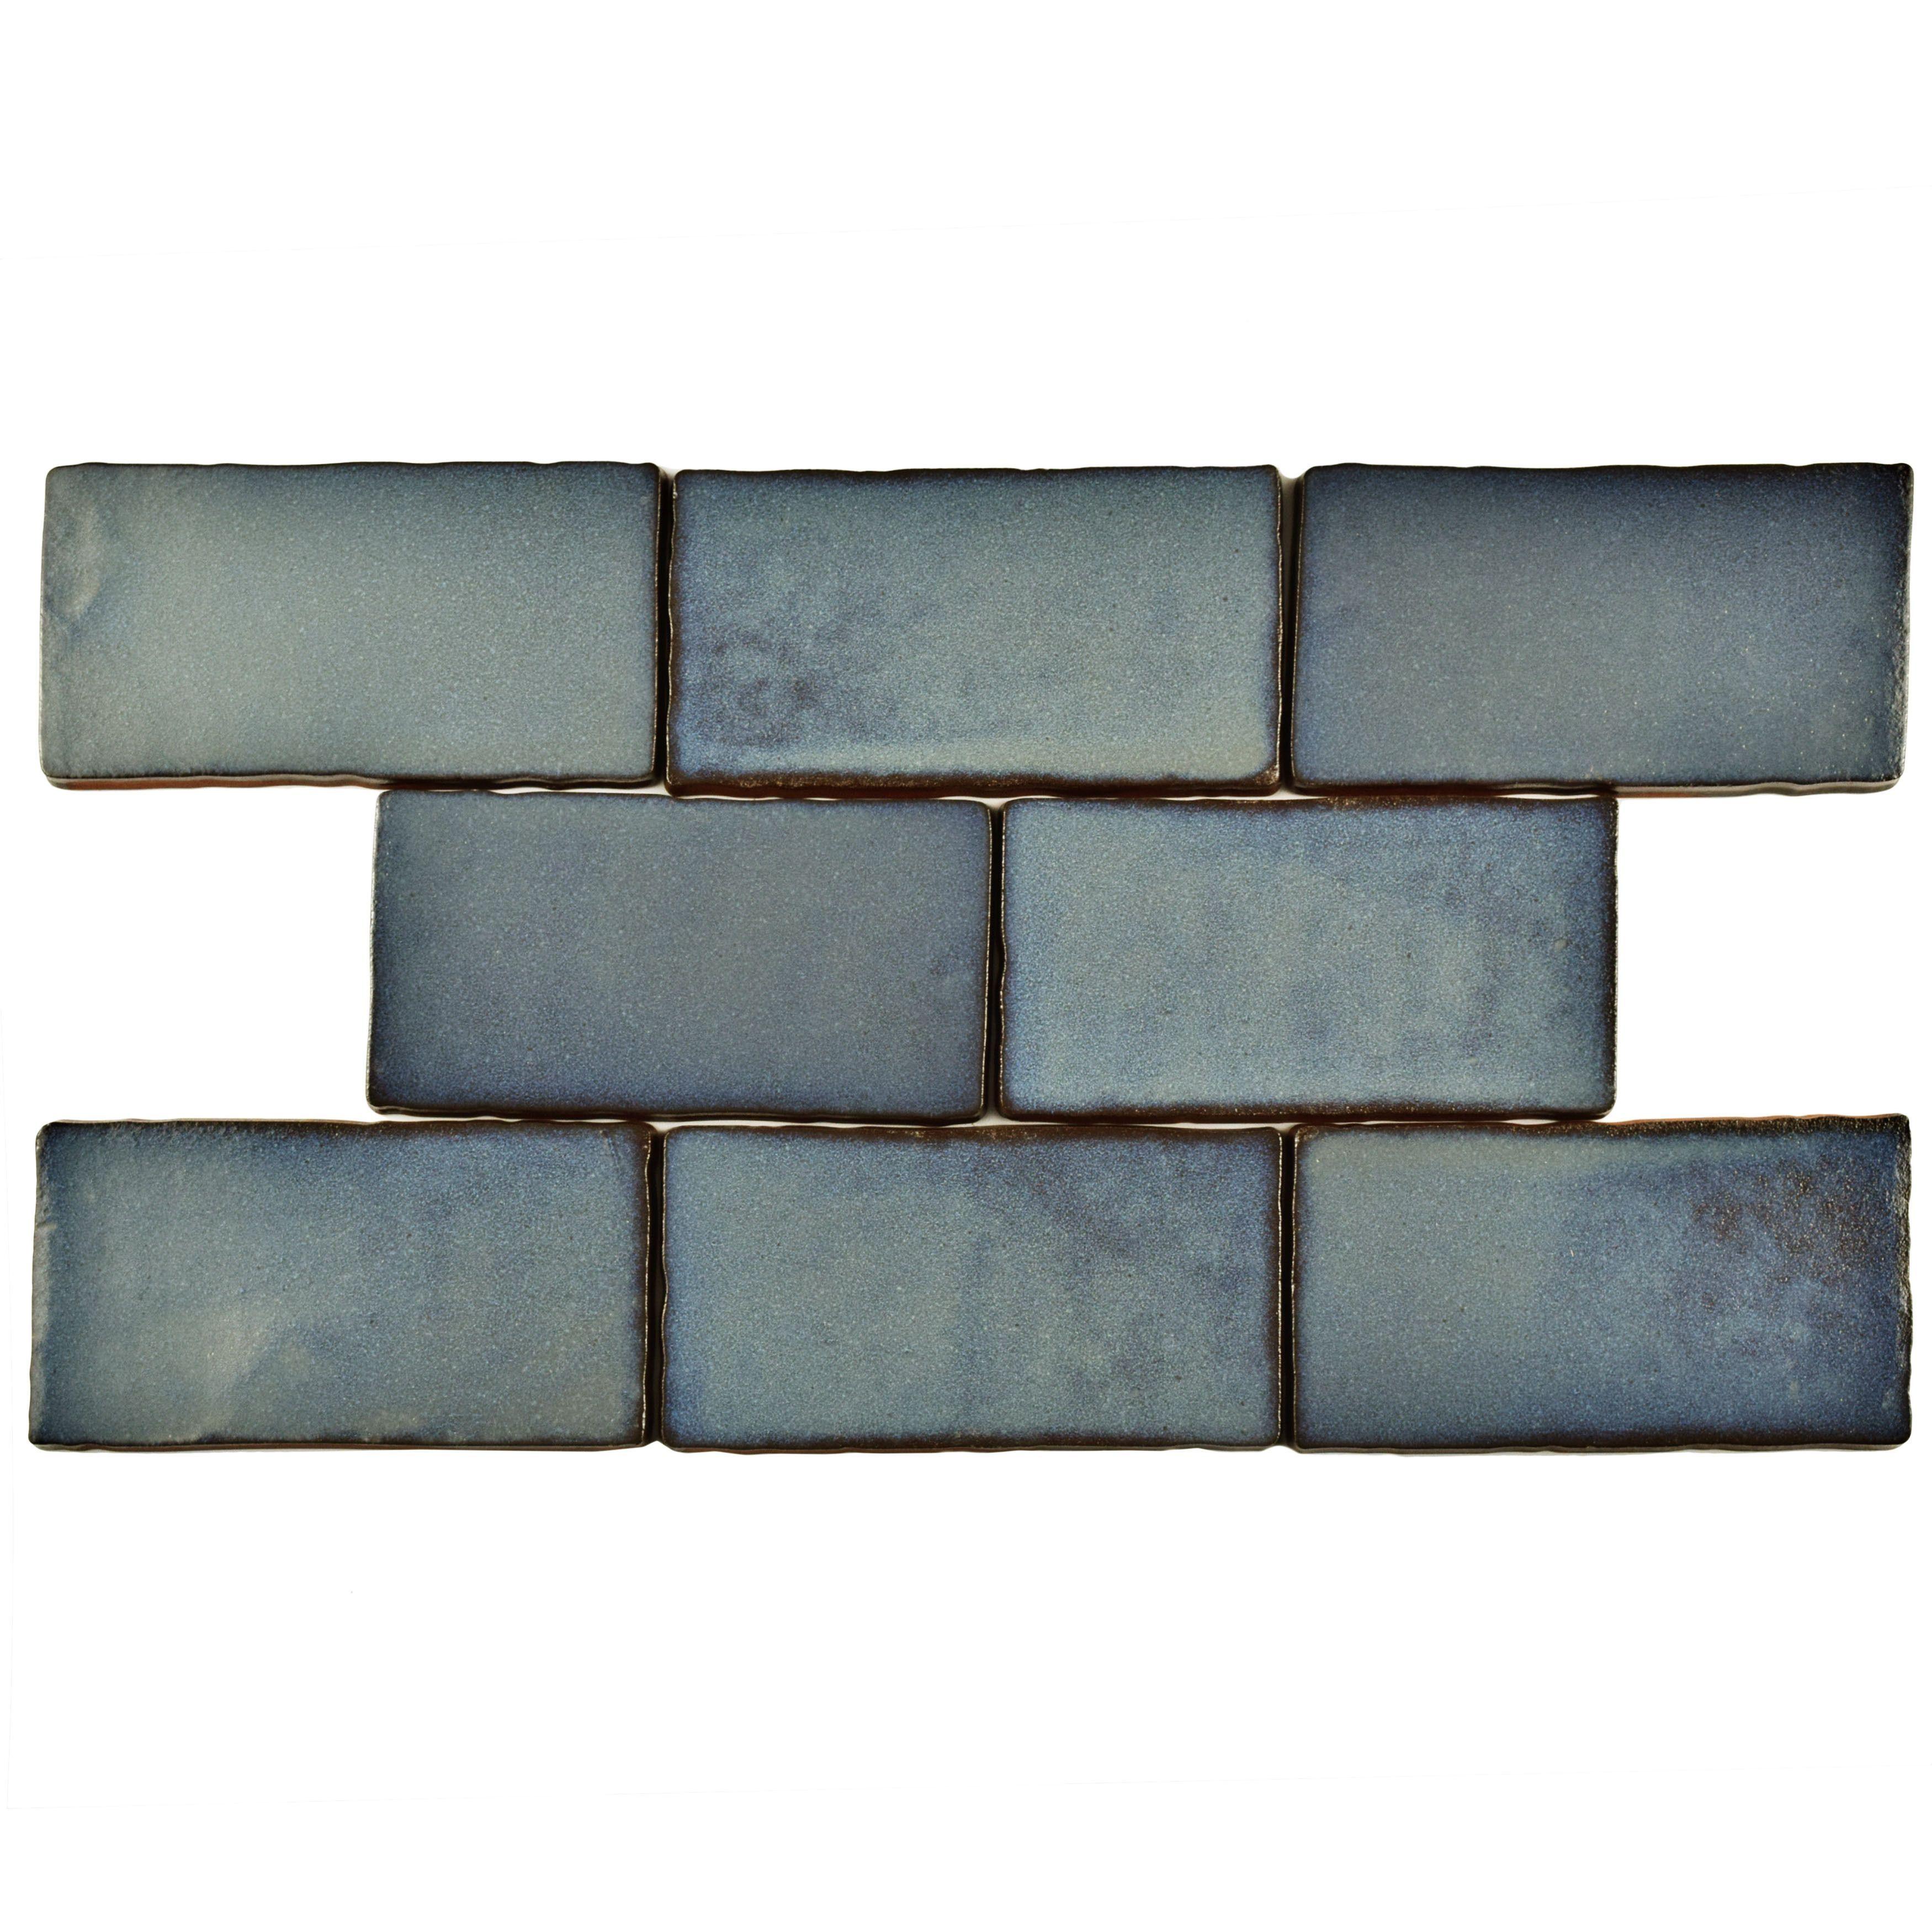 SomerTile 3x6 inch Antiguo Special Griggio Ceramic Wall Tile 8